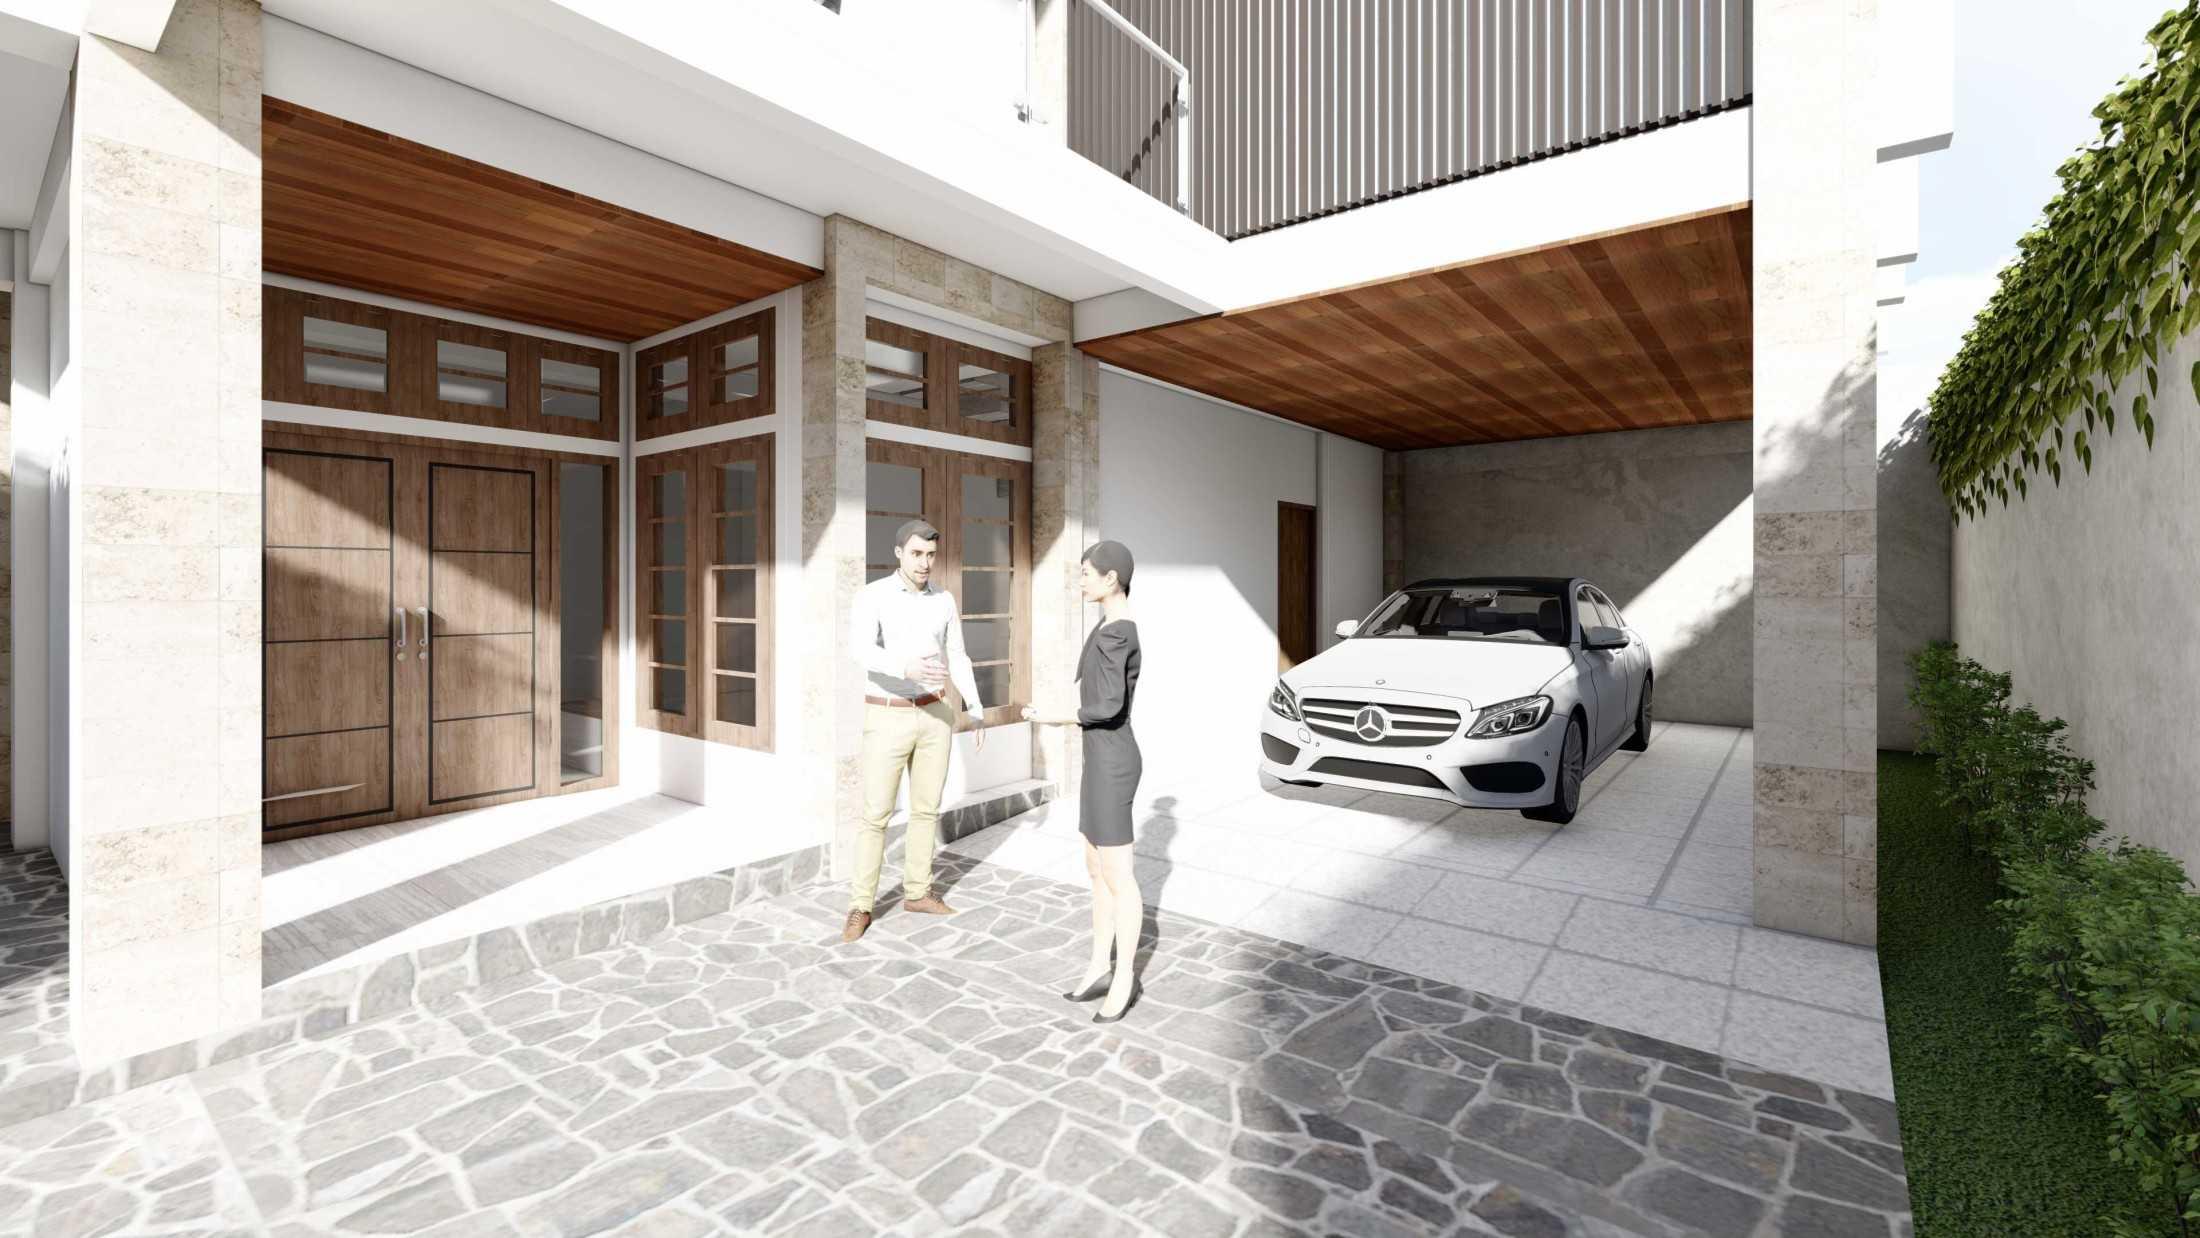 Astabumi Studio Js House Timor Leste Dili, Timor-Leste Pati, Kec. Pati, Kabupaten Pati, Jawa Tengah, Indonesia Cv-Astabumi-Manunggal-Prakarsa-Js-House-Timor-Leste  119261